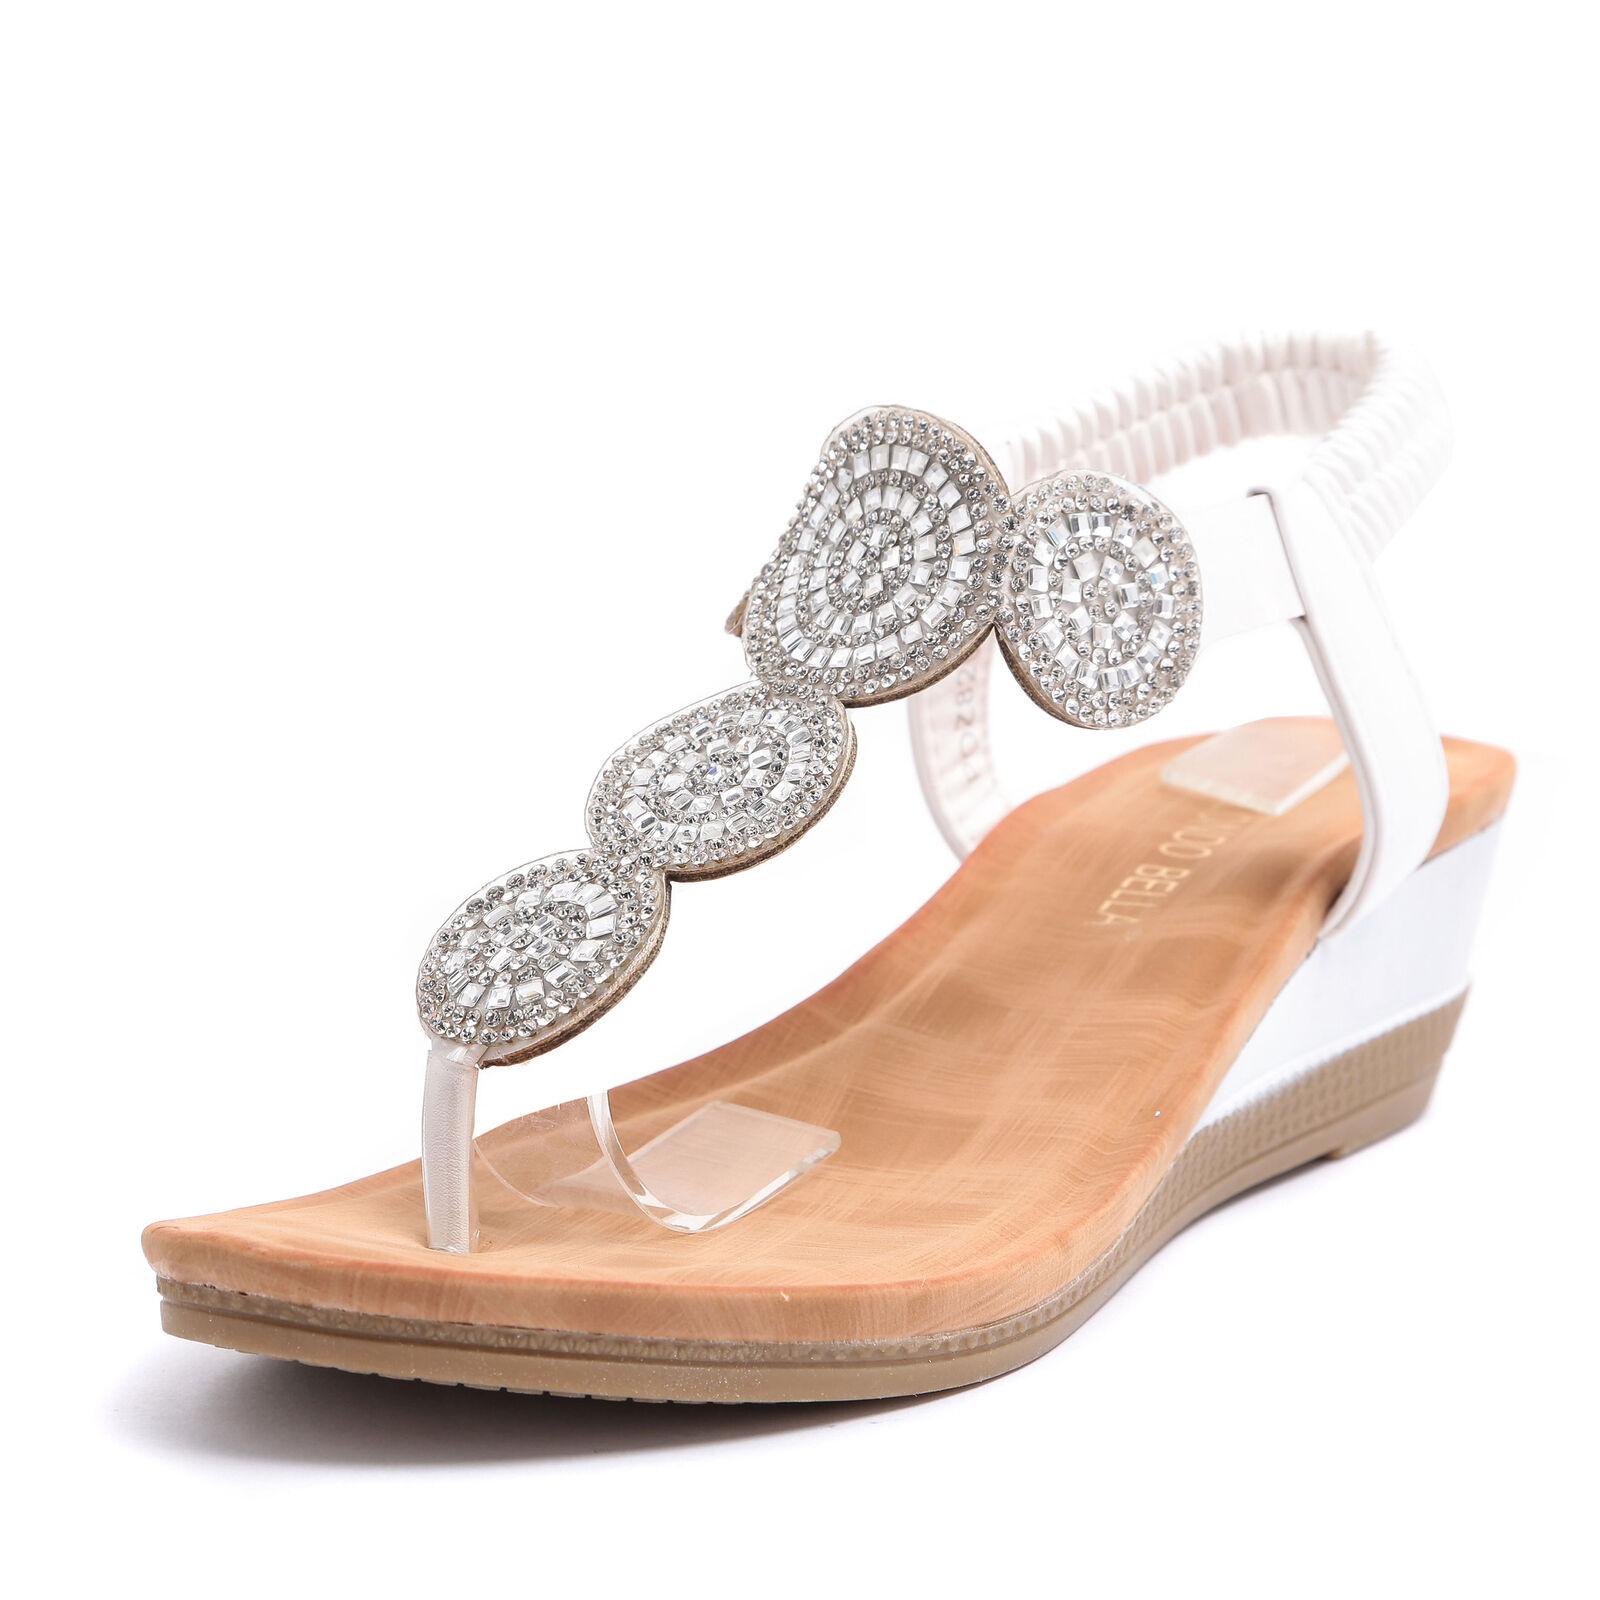 Sandali donna scarpe infradito strass e pelle flatform zeppa cinturino POZ8204-1